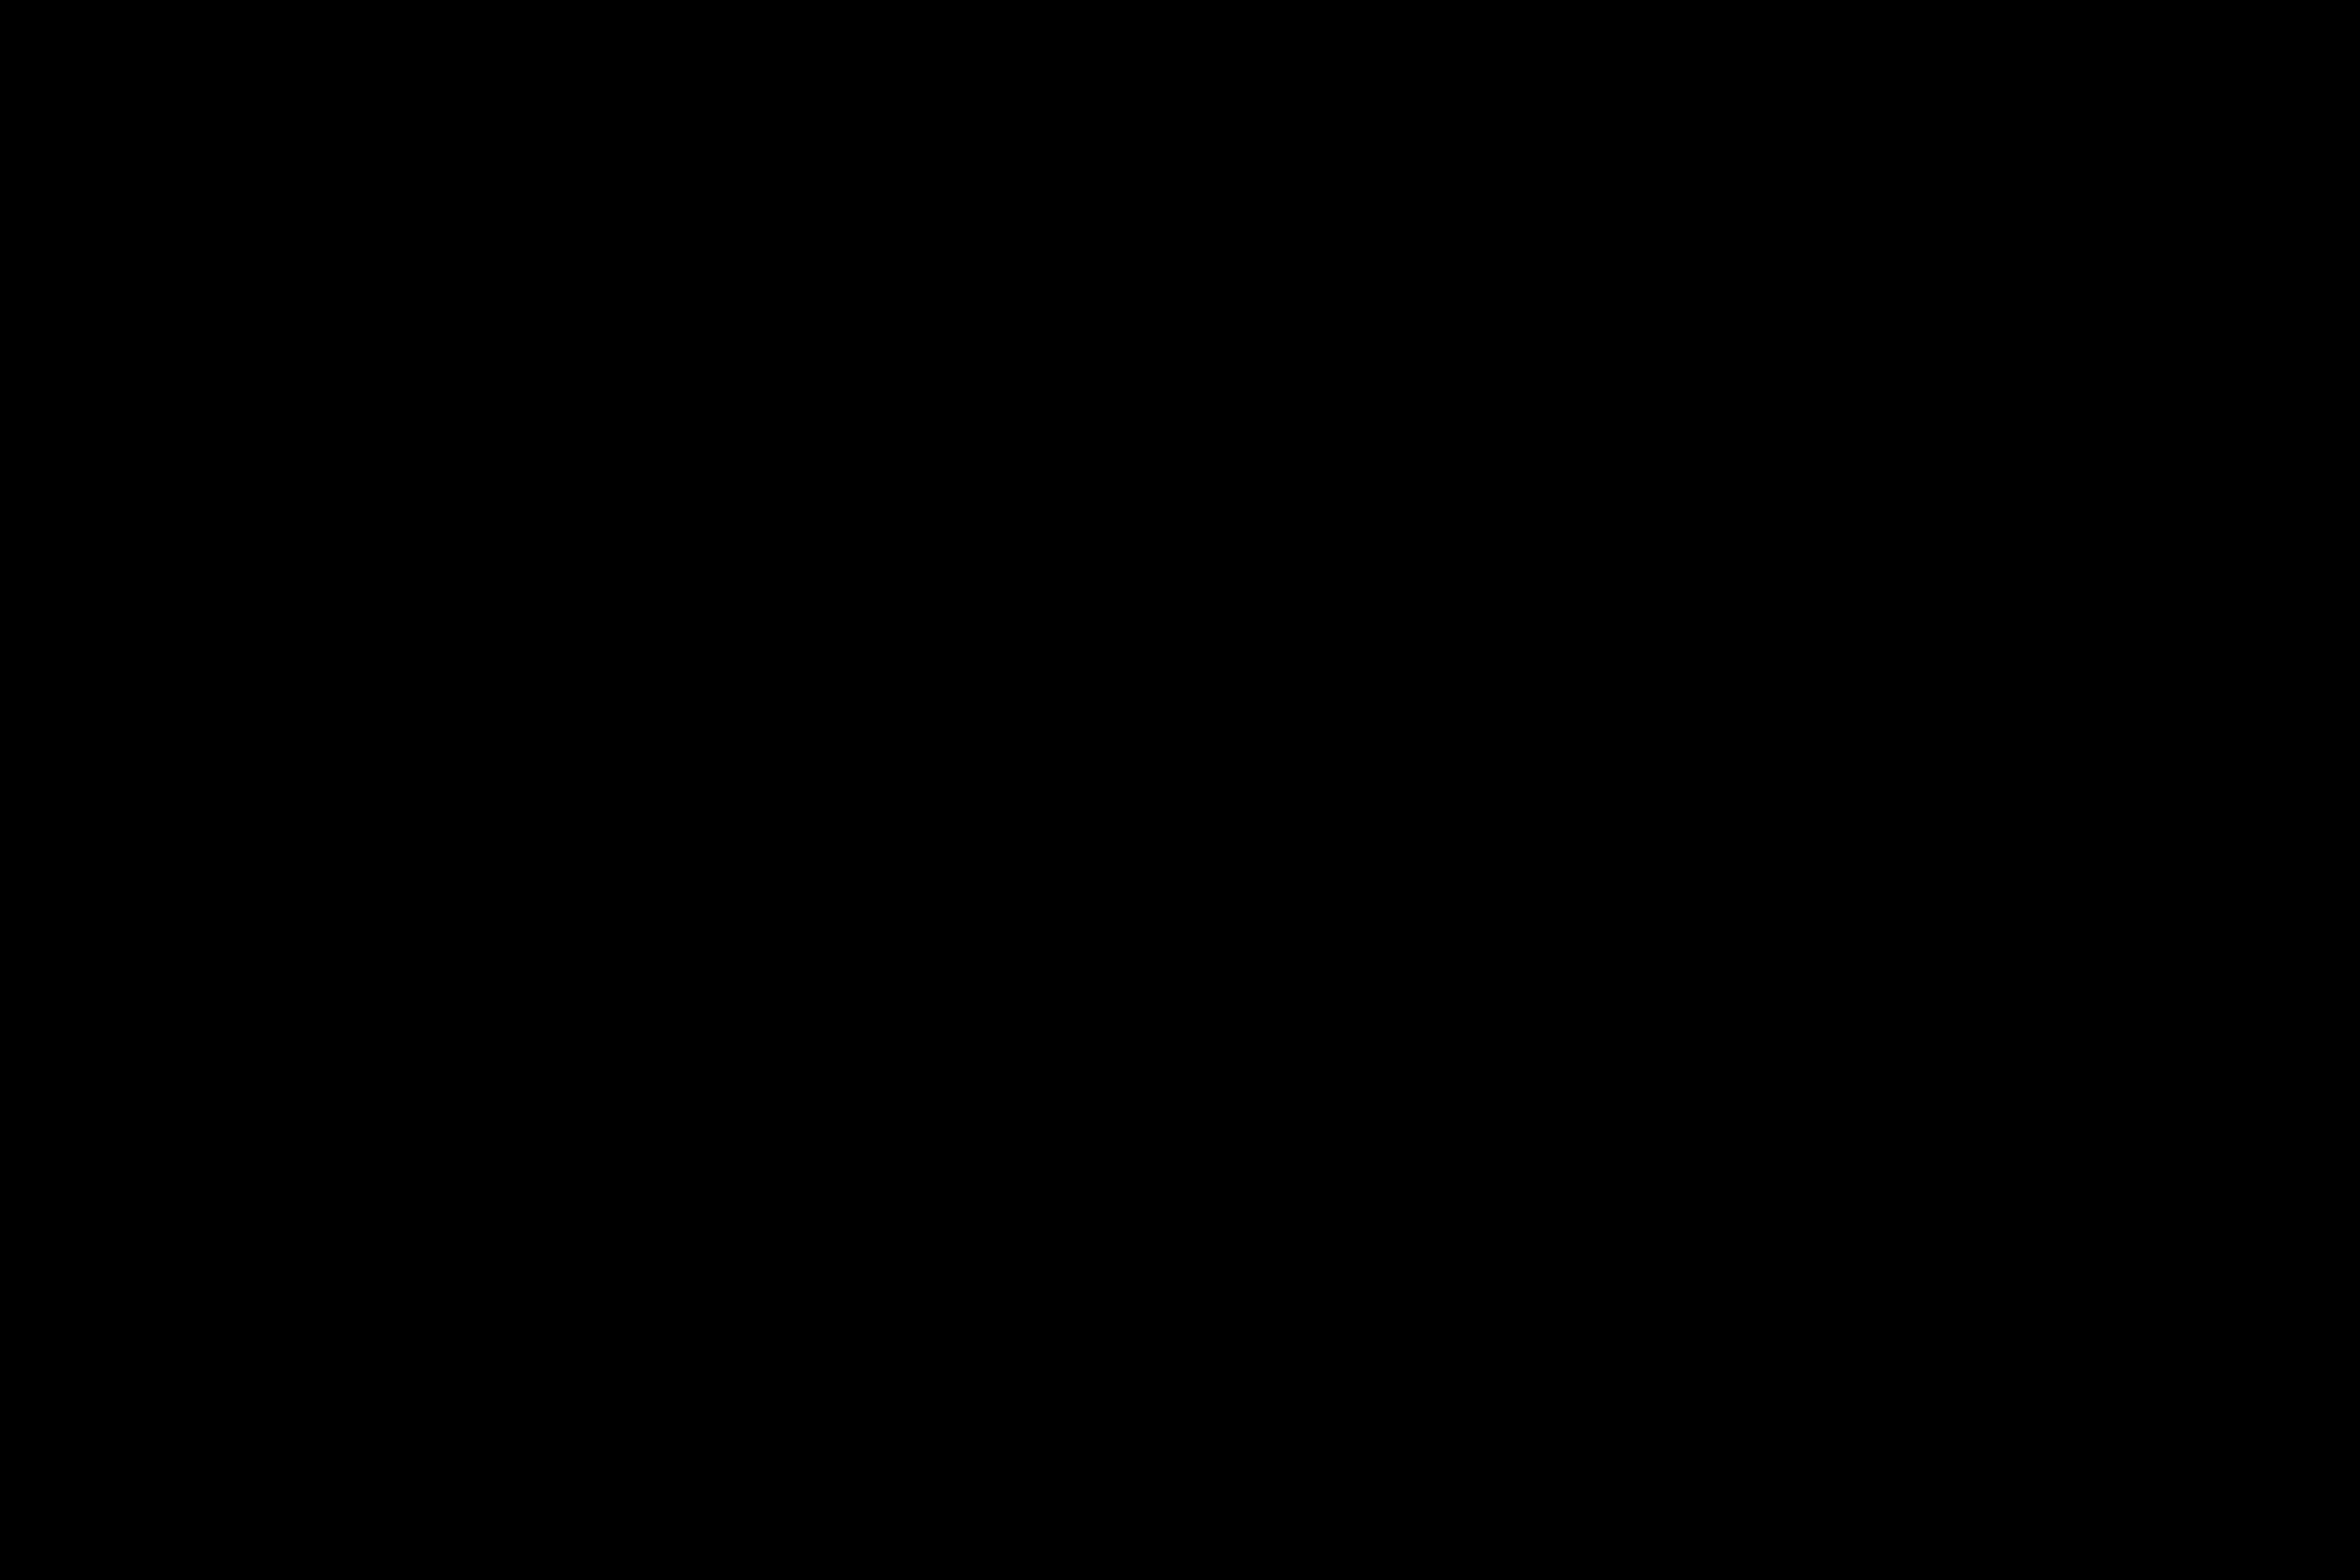 microsoft_excel-logo-9